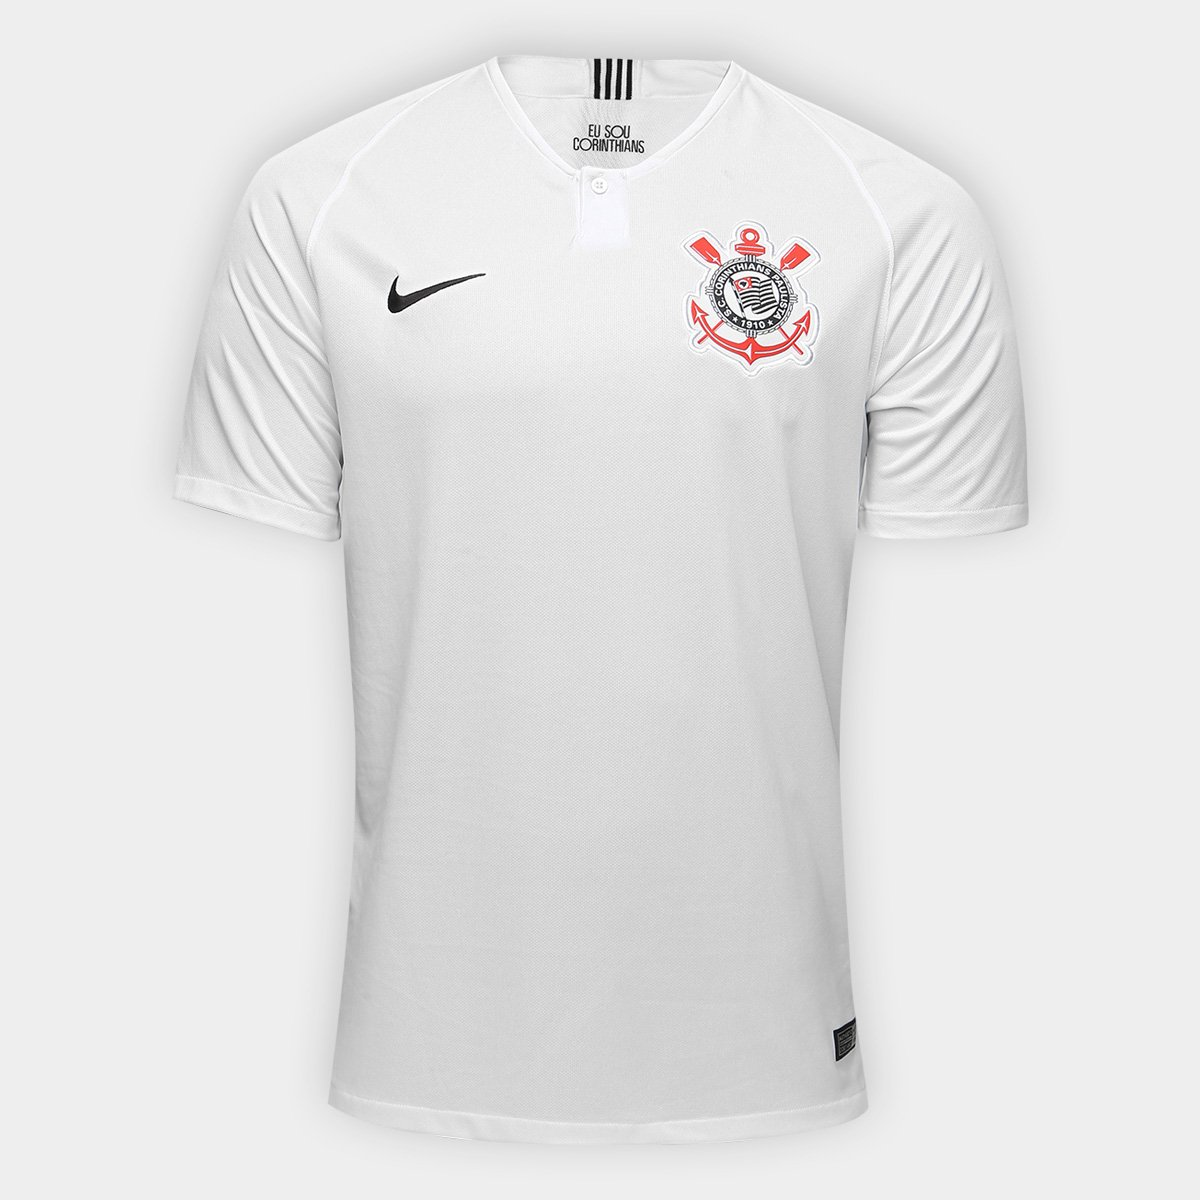 bd88399ba Camisa Corinthians I 18 19 s n° Torcedor Nike Masculina - Branco e ...